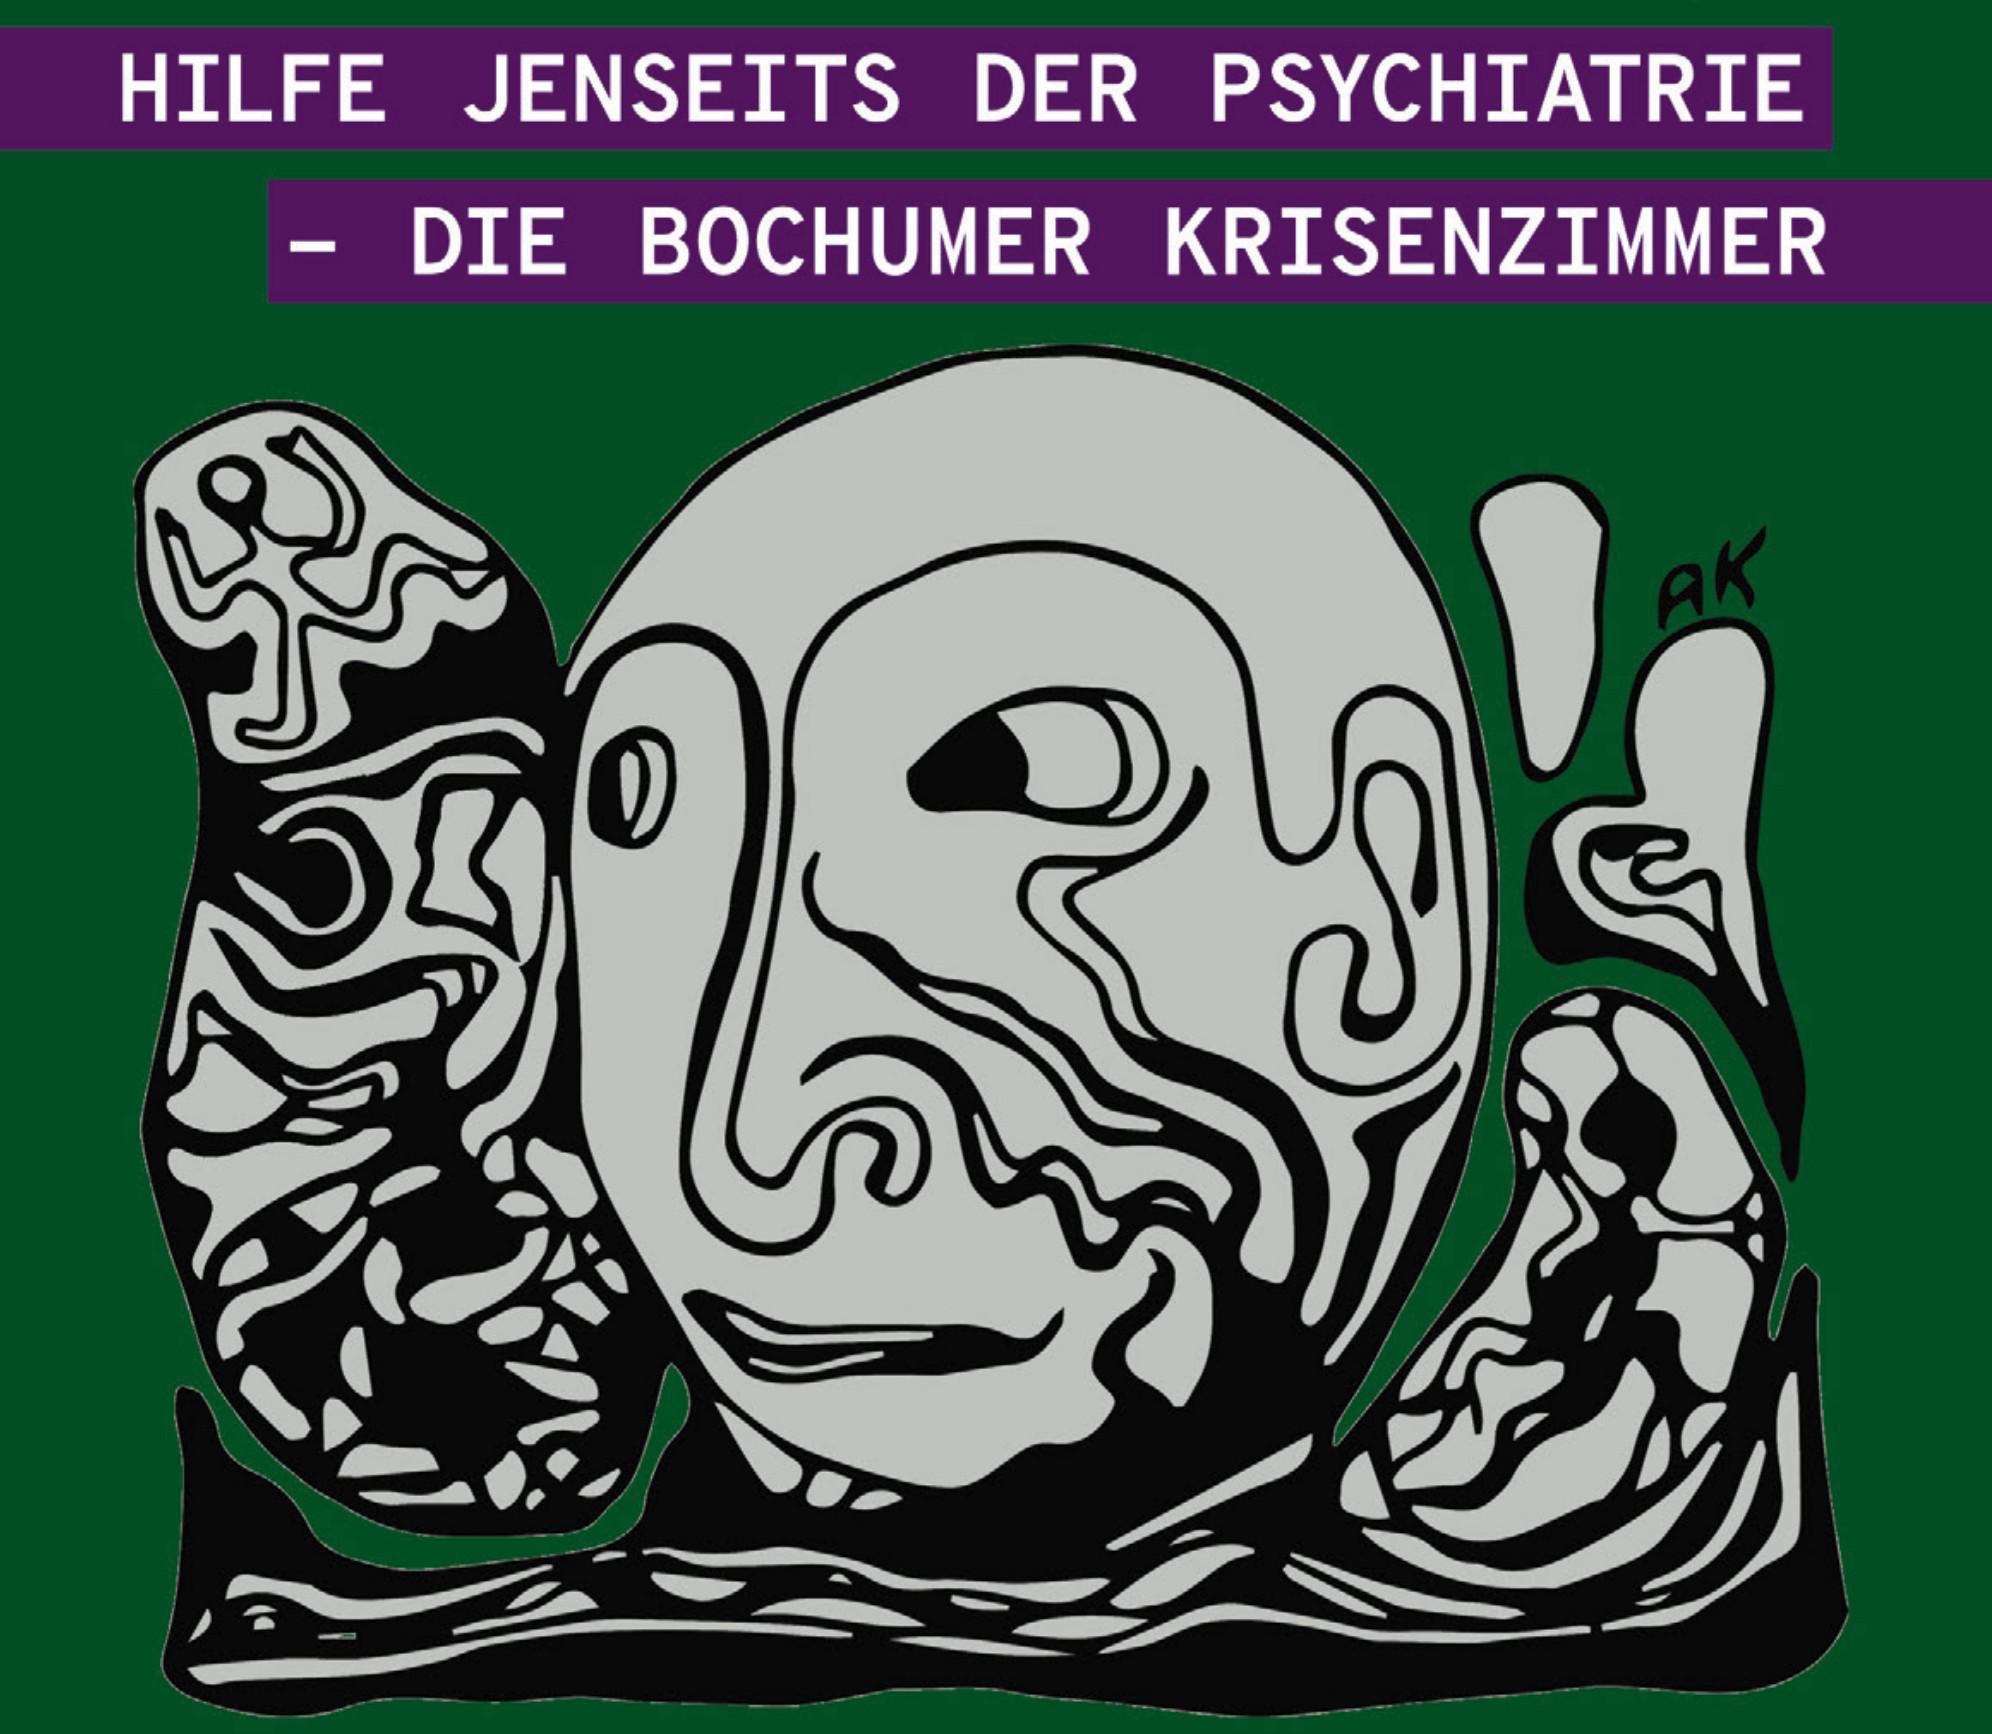 You are currently viewing Broschüre Hilfe jenseits der Psychiatrie – Die Bochumer Krisenzimmer